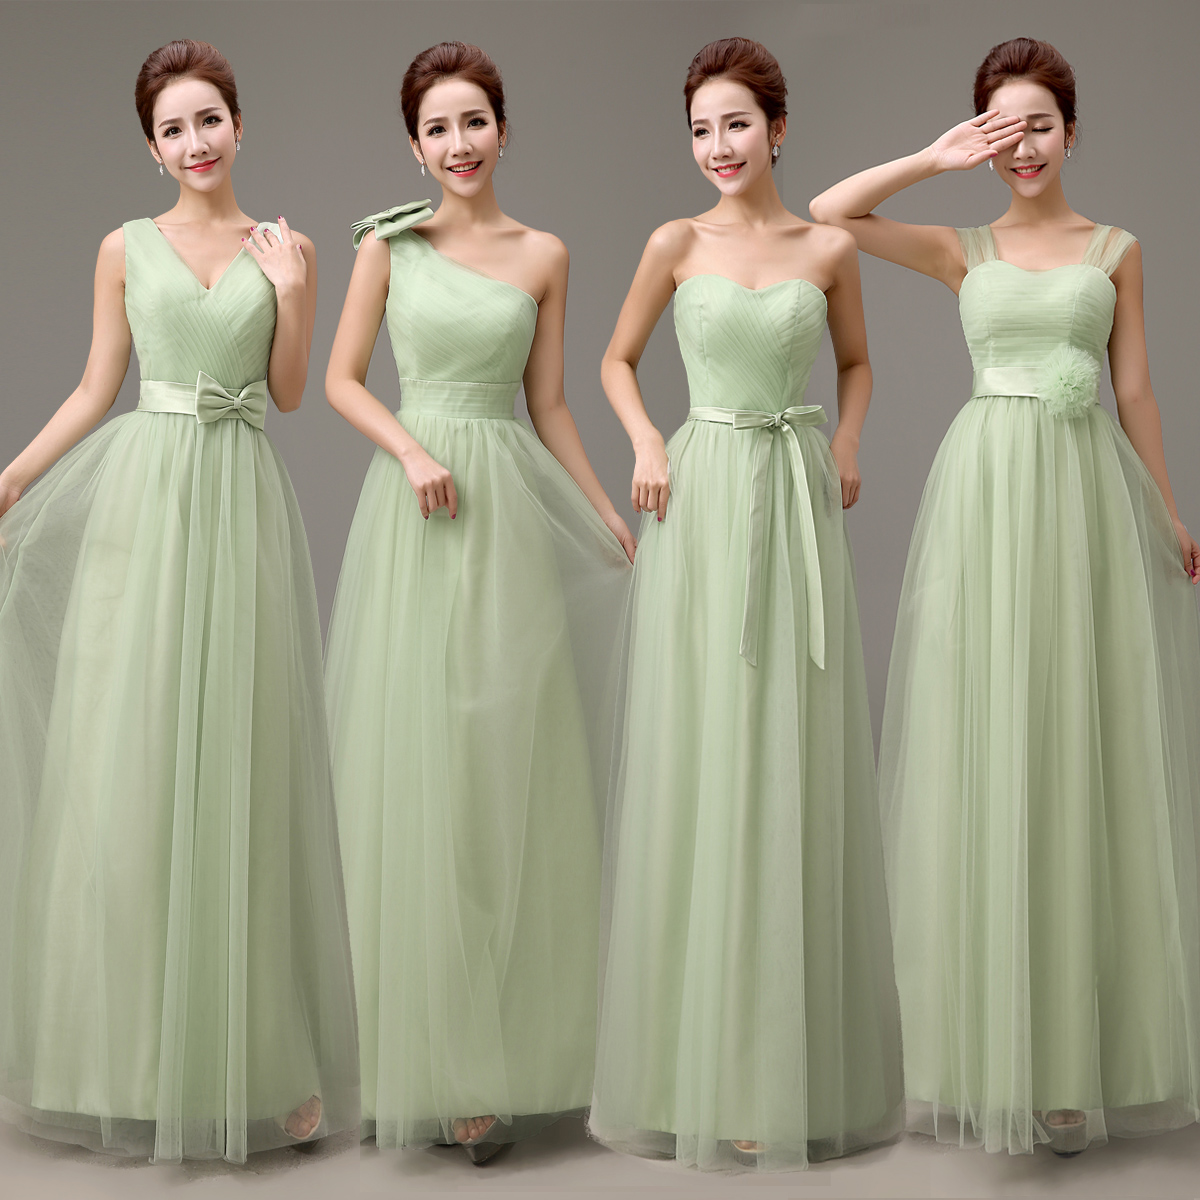 aliexpress prom dress reviews